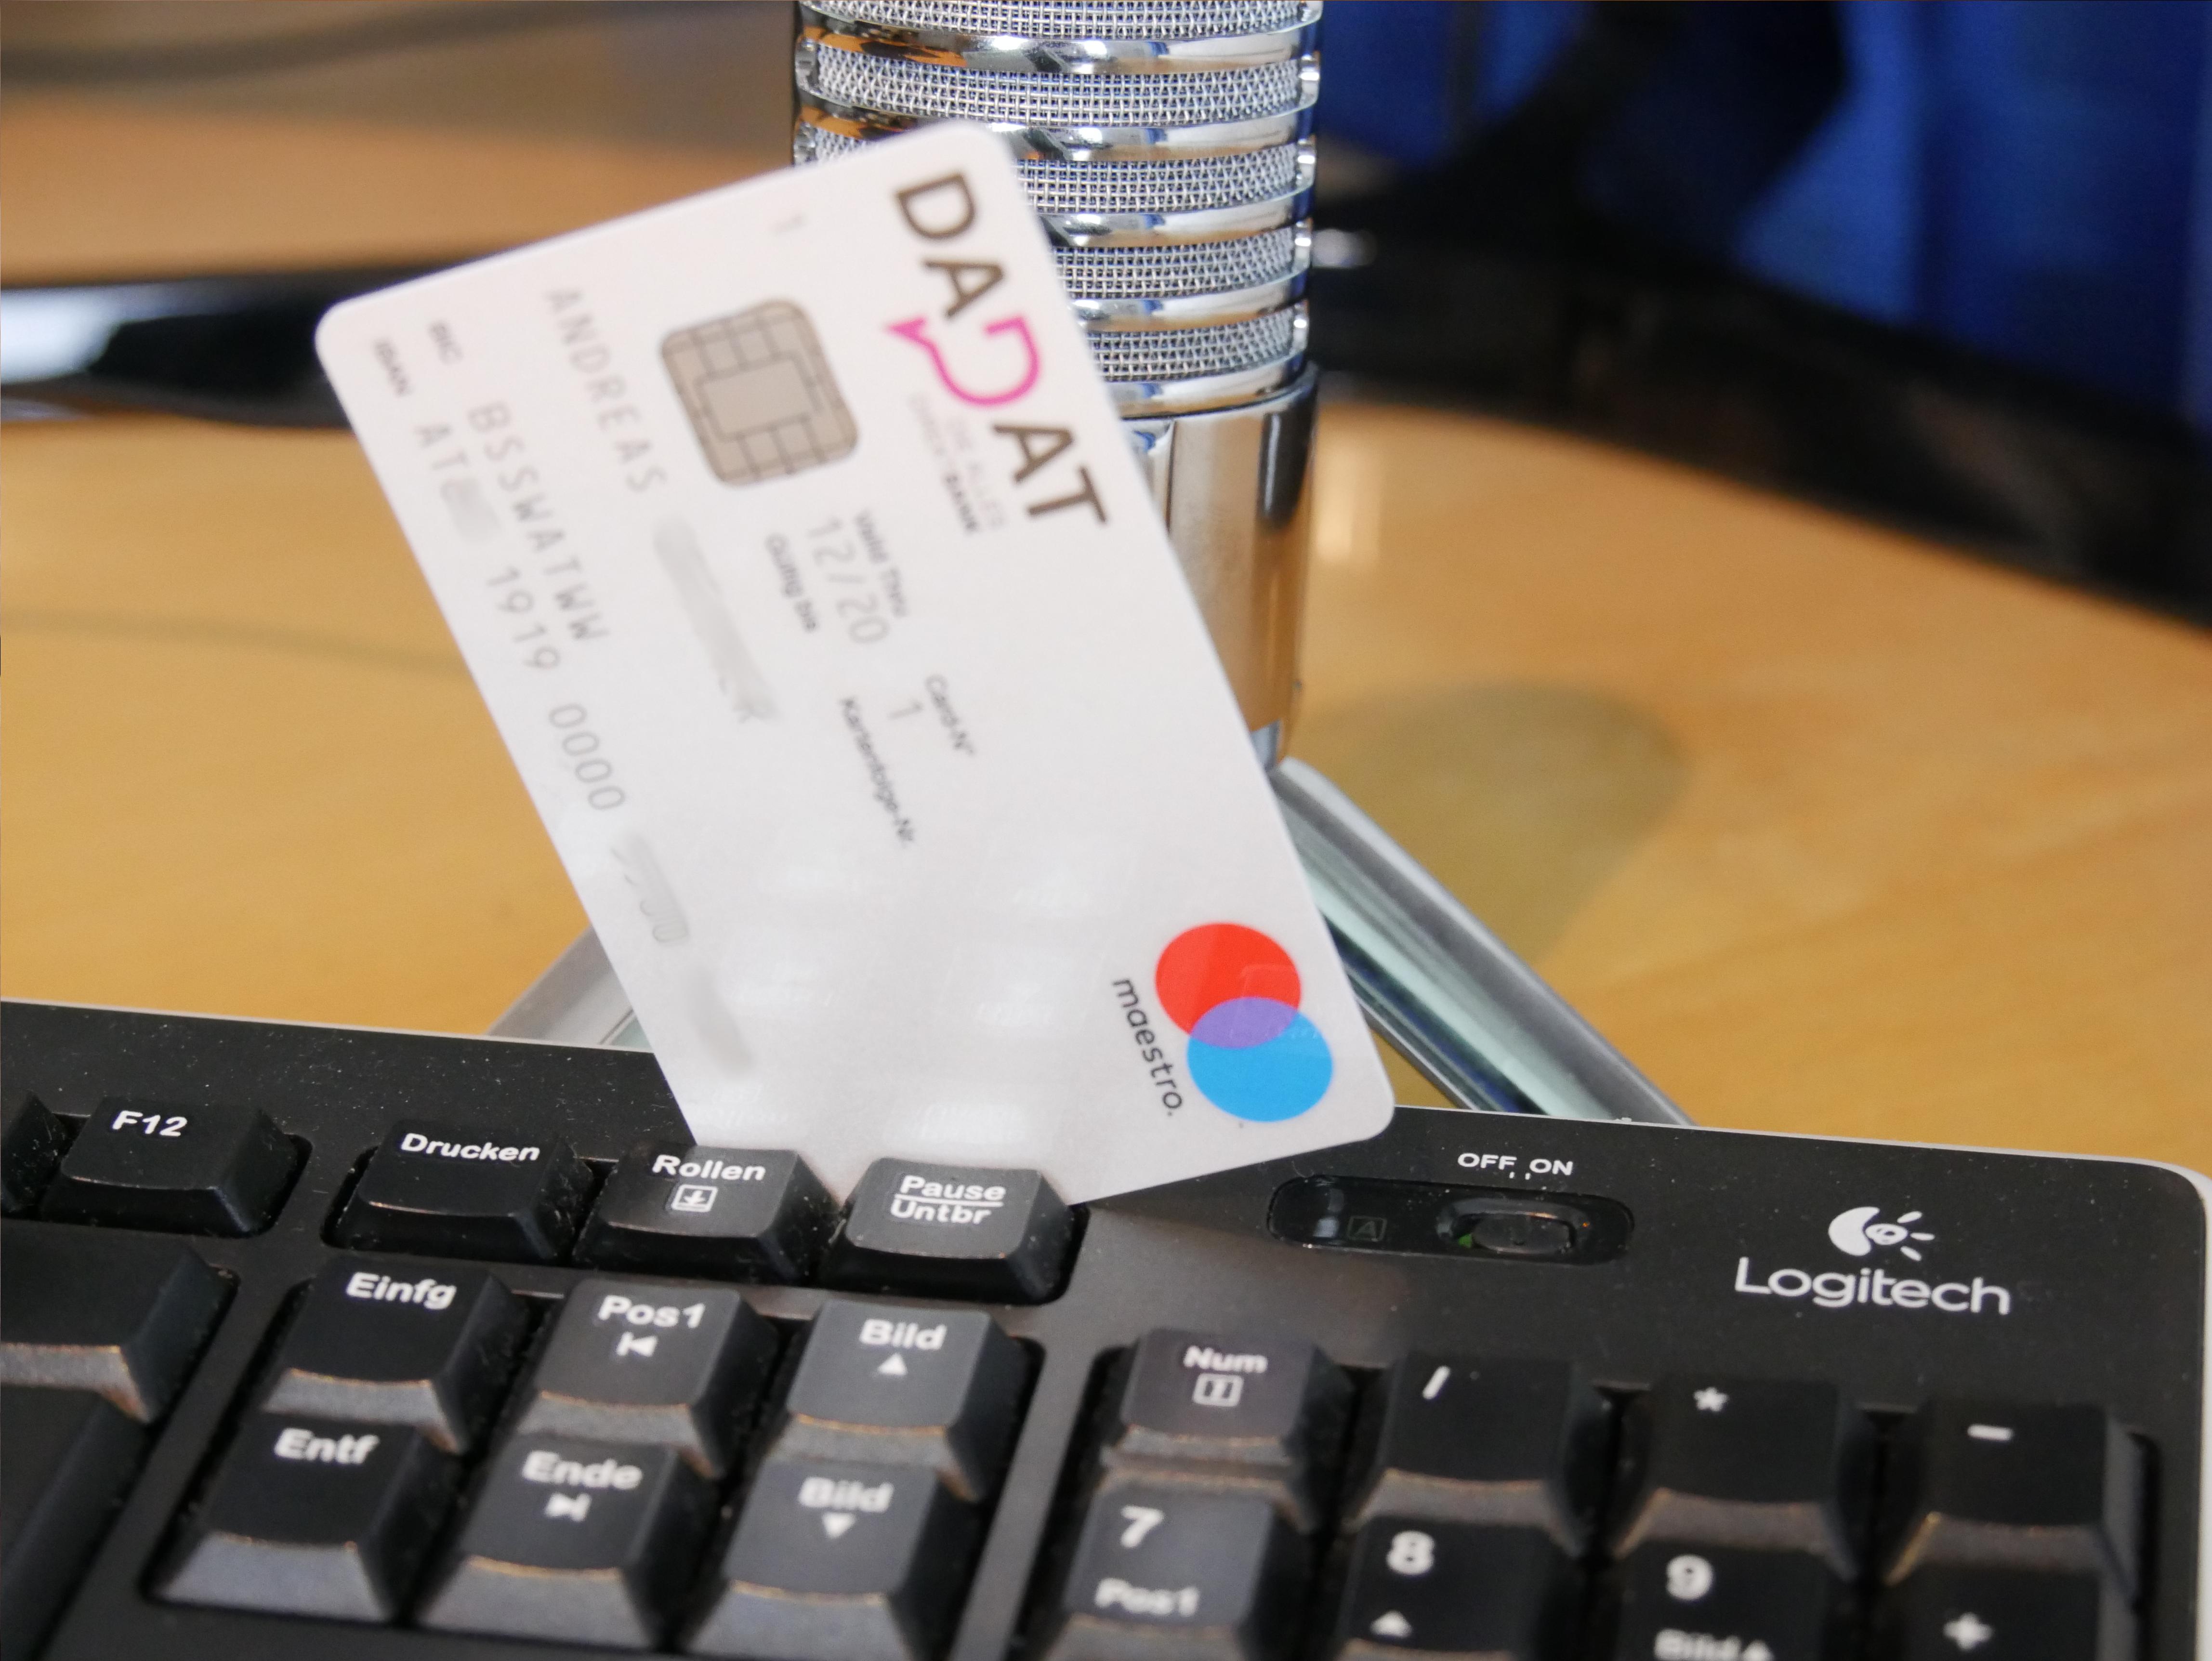 DADAT Girokonto mit Gehaltseingang - Test & 4 pers. Erfahrungsberichte